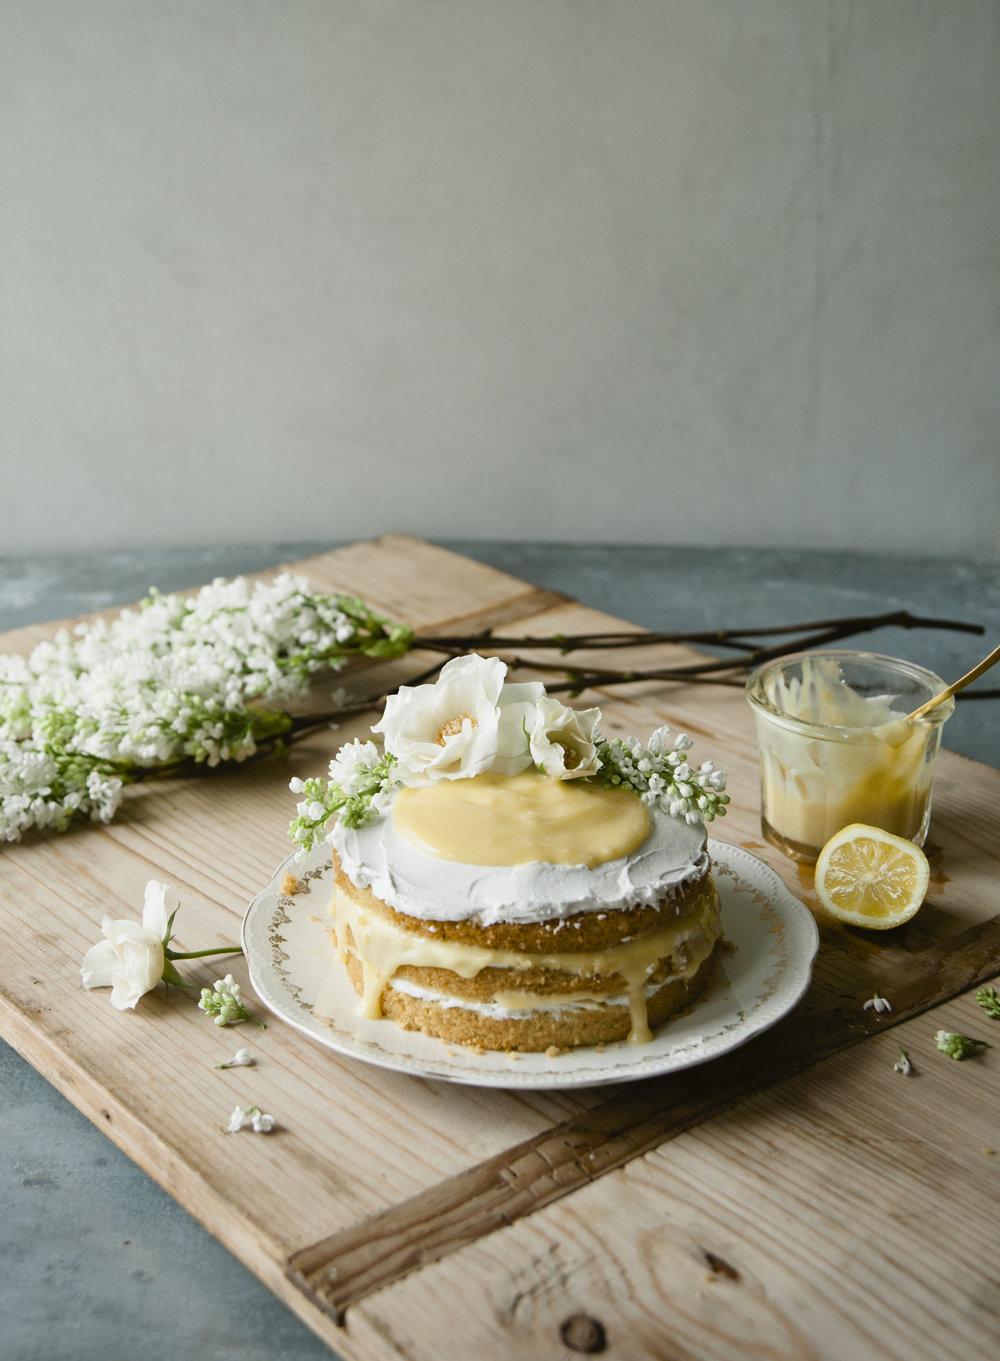 Sweet Laurel_Fluffy Lemon Coconut Cake_Claire Thomas.JPG